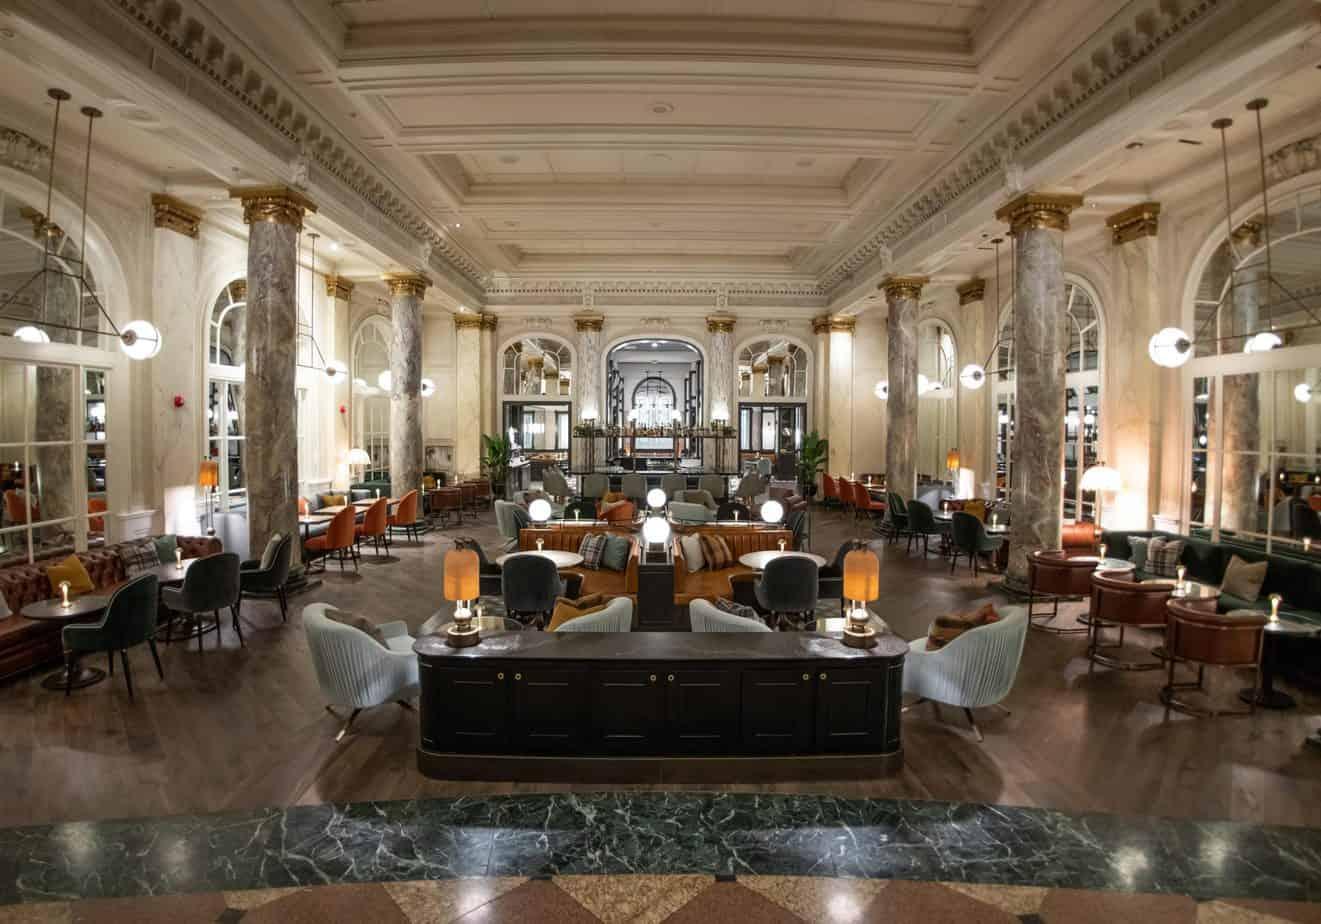 hawthorn lobby image